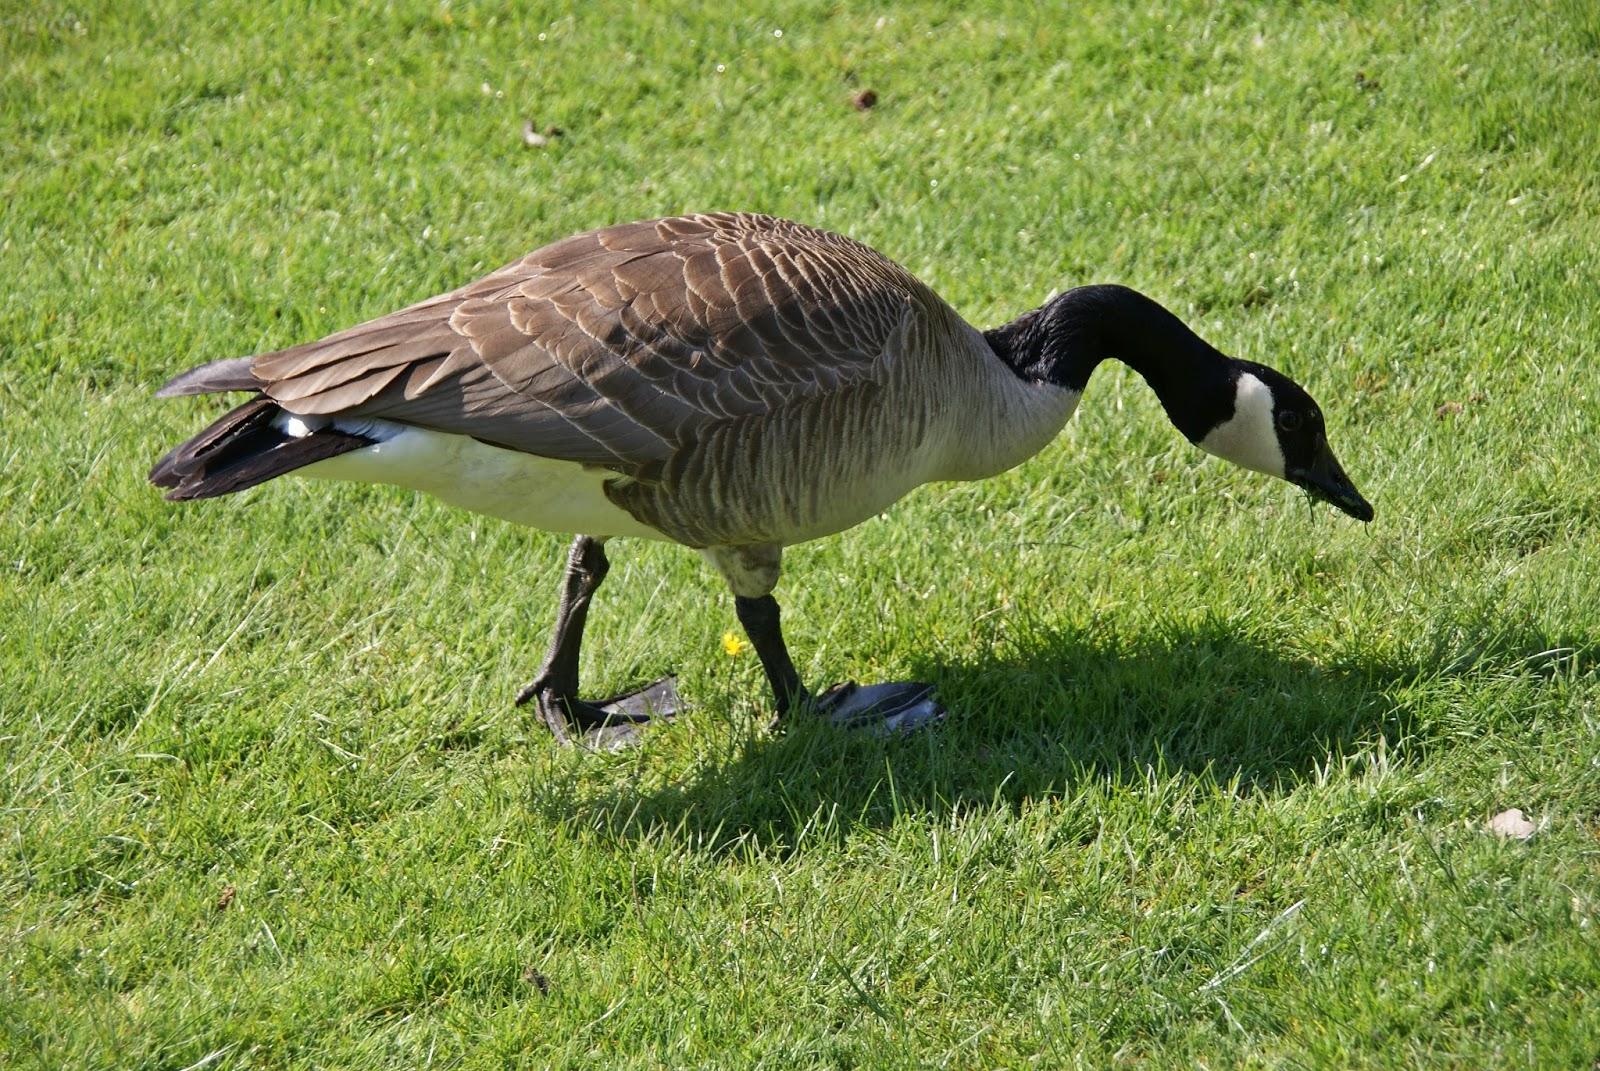 Canada Goose victoria parka online discounts - My Bird Blog: Canada Goose